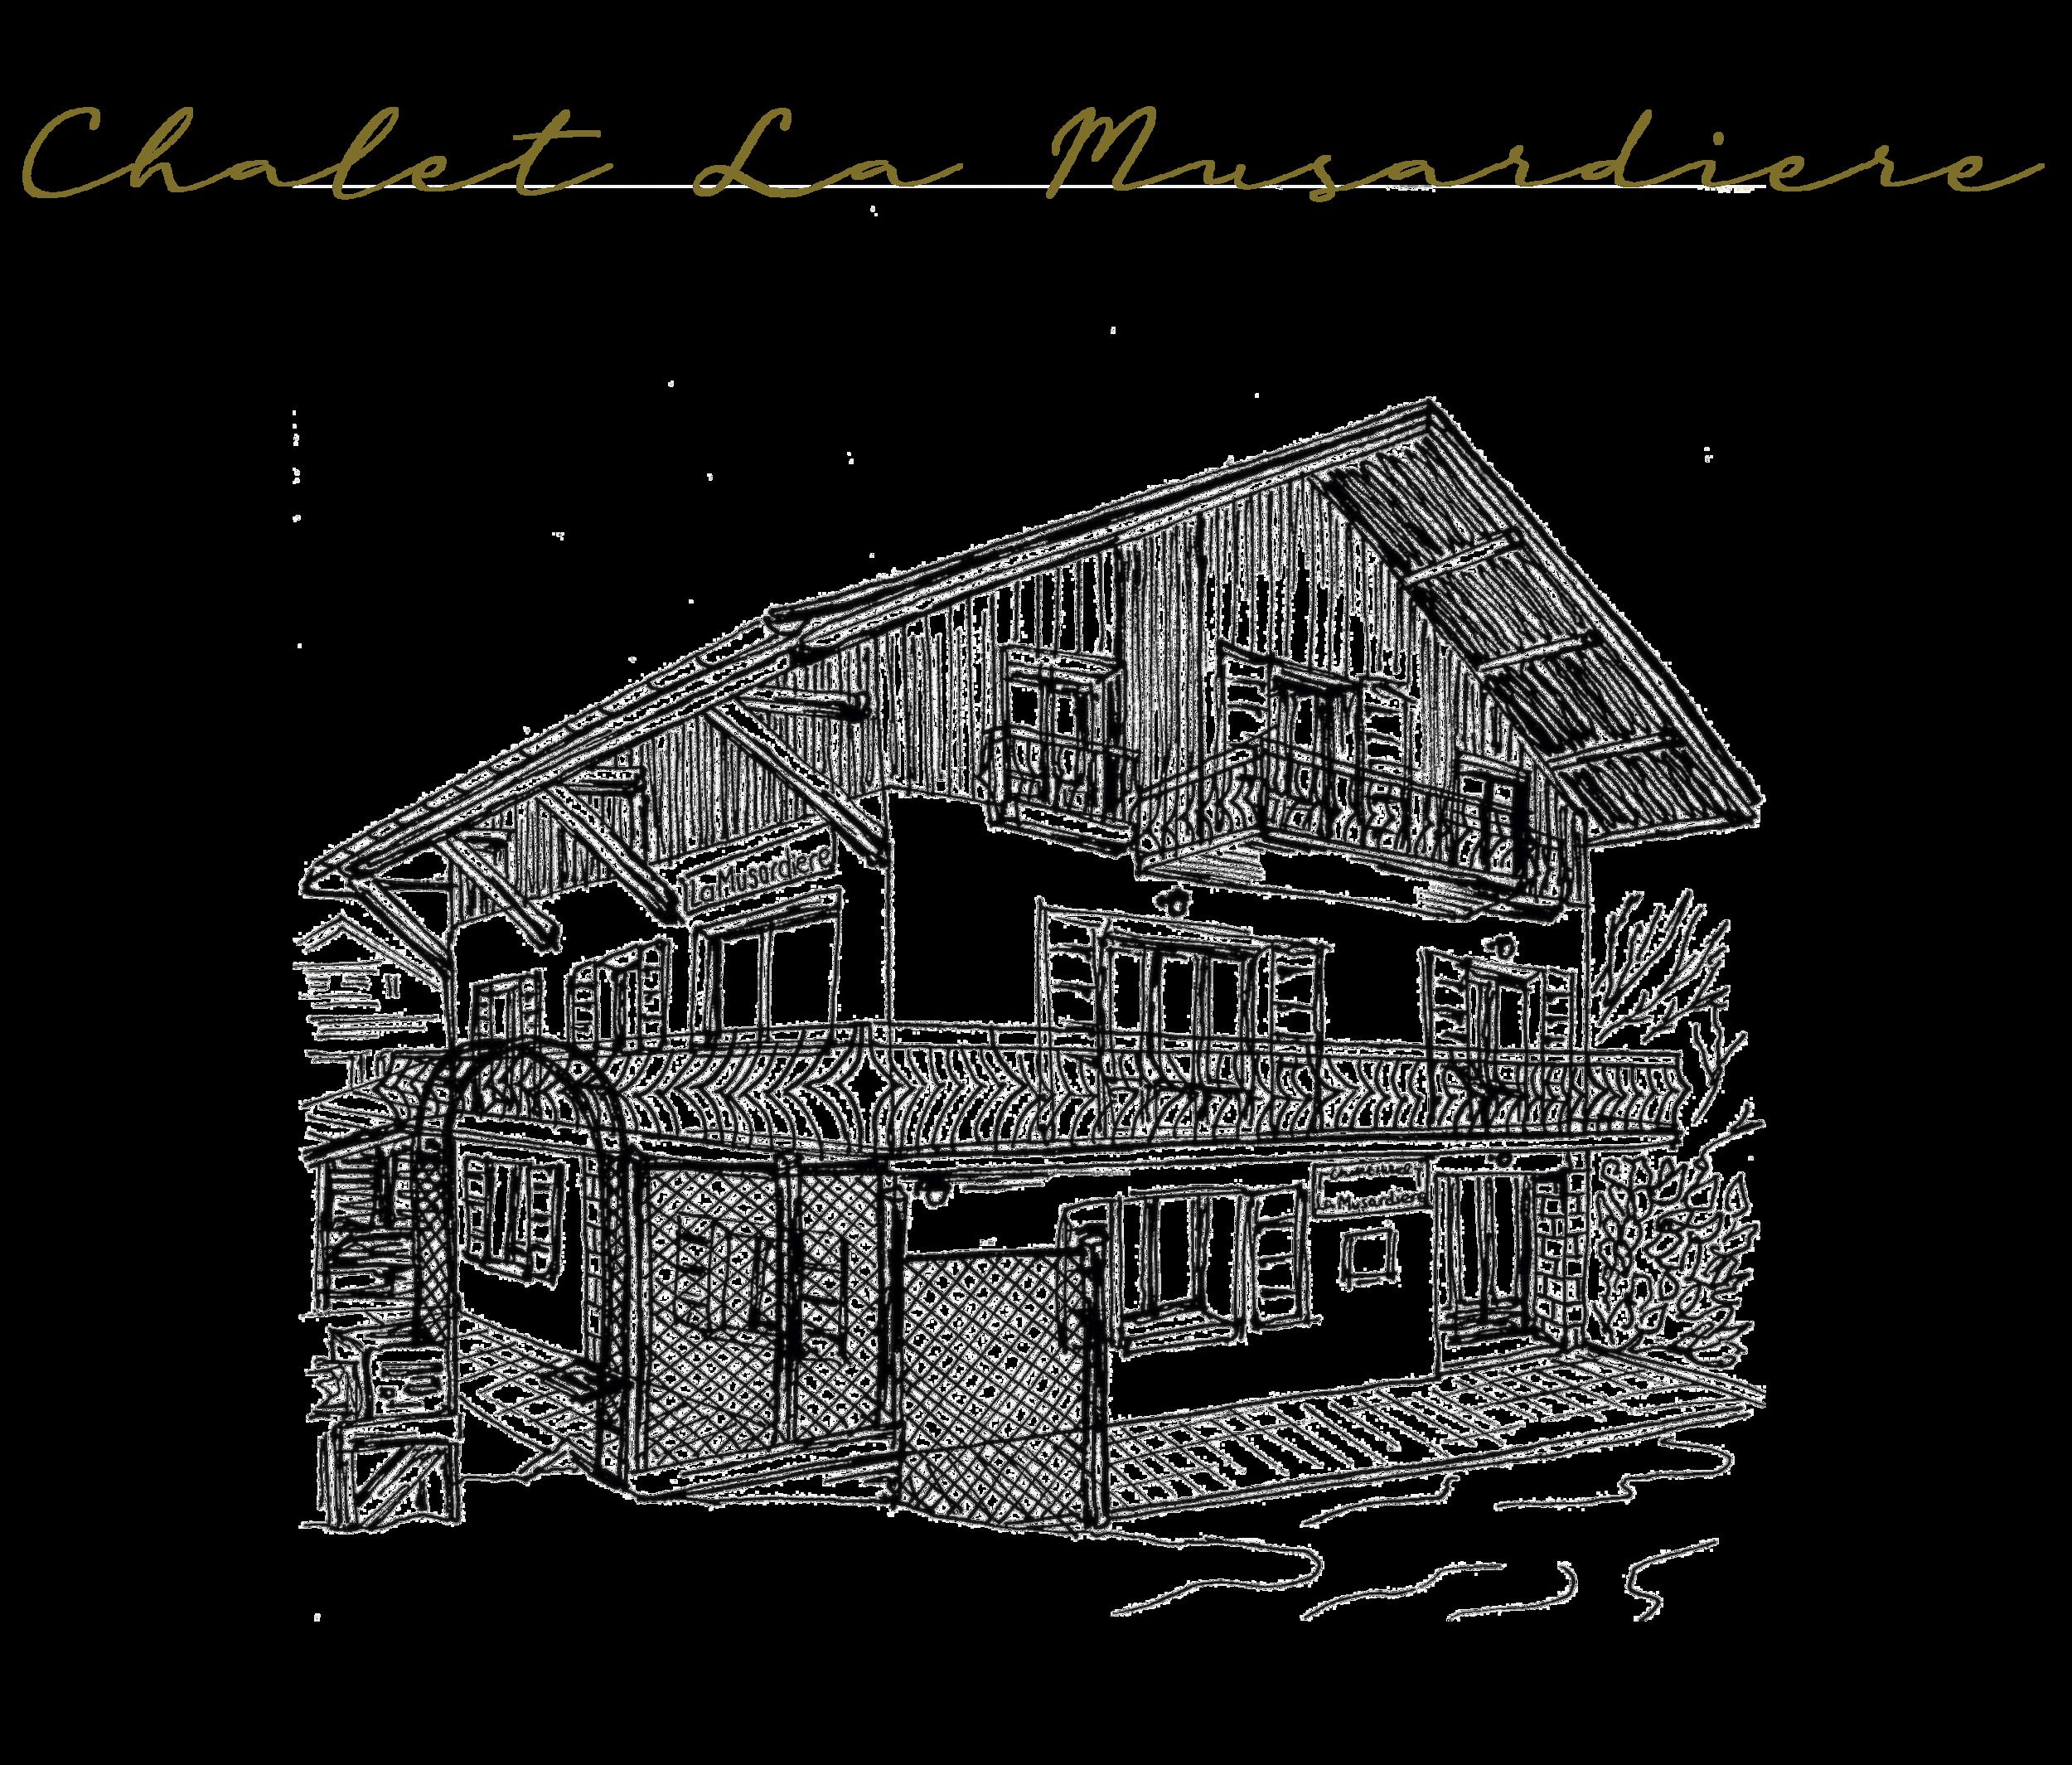 luxury-ski-chalet-la-musardiere-tgski-morzine.png